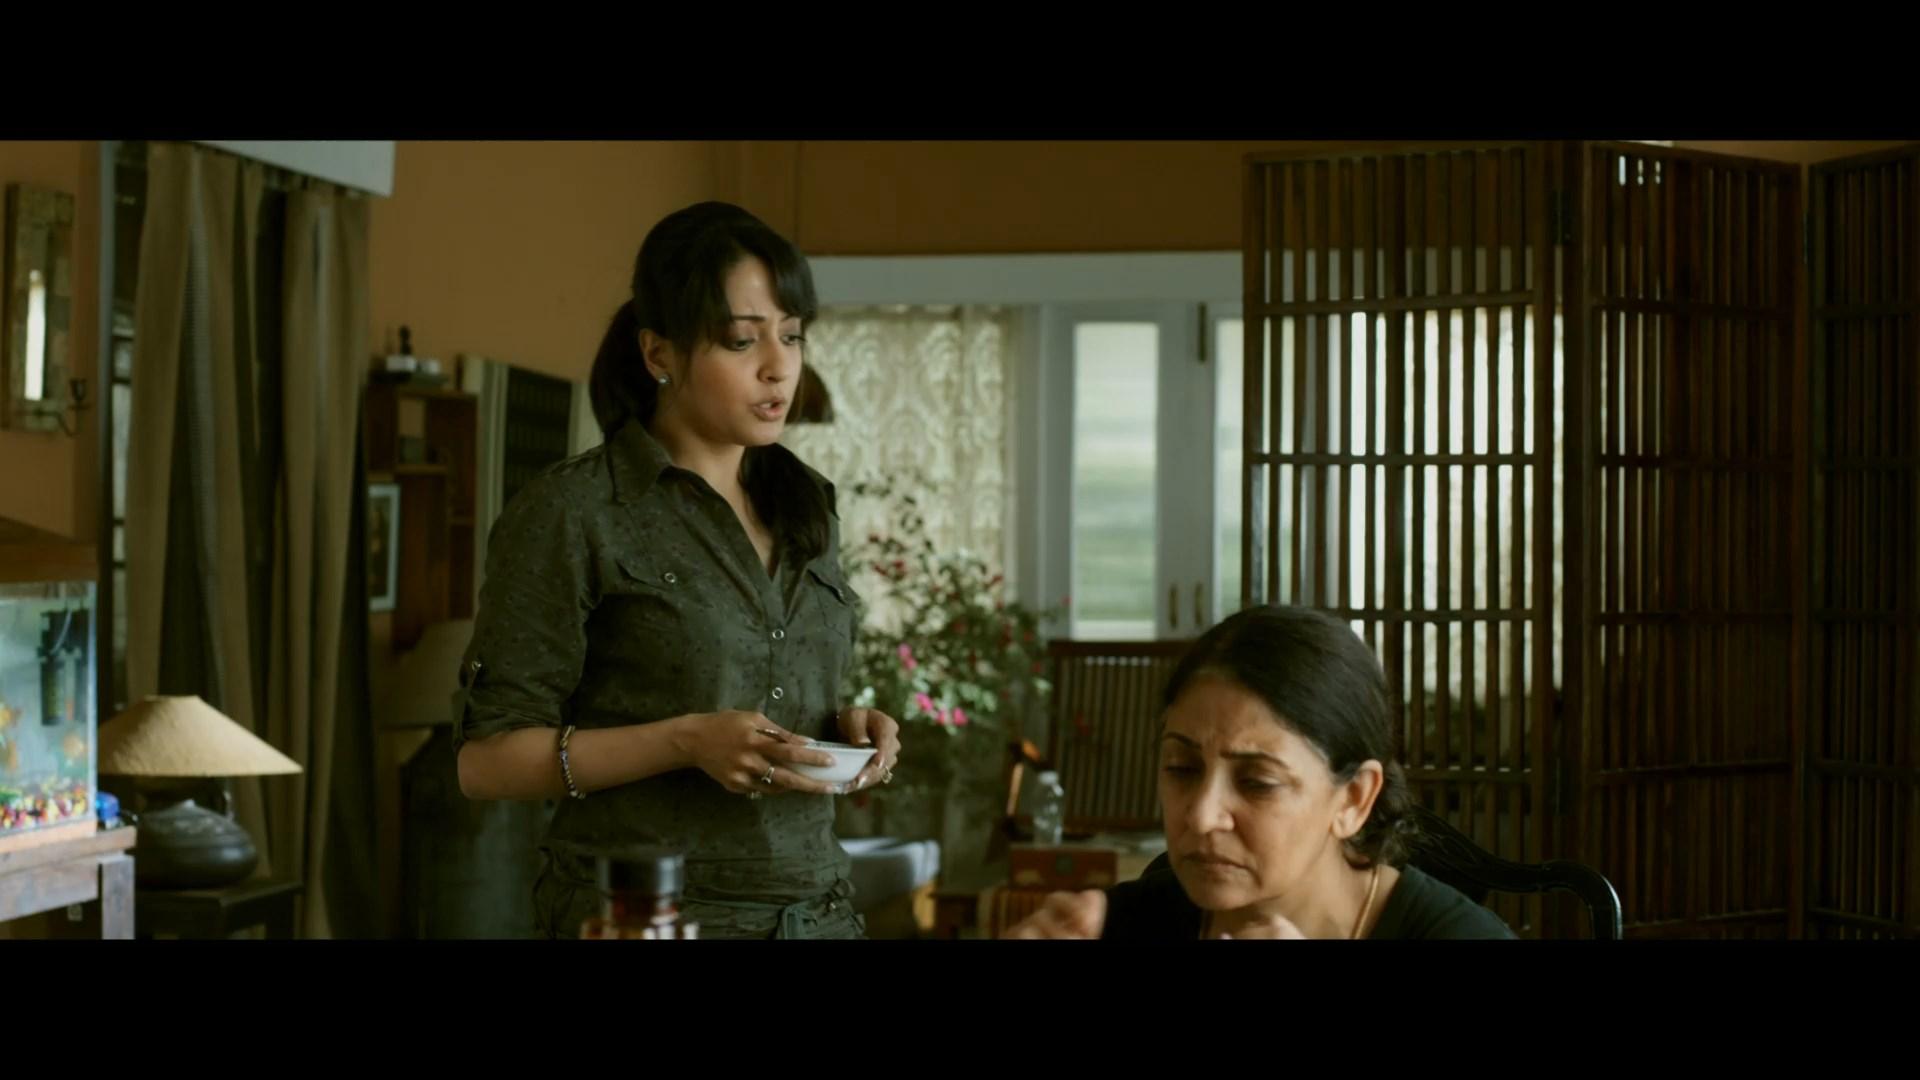 Memories in March (2020) Bengali 1080p WEB DL H264 AAC EvAn.mkv snapshot 00.23.07 [2020.06.05 06.12.